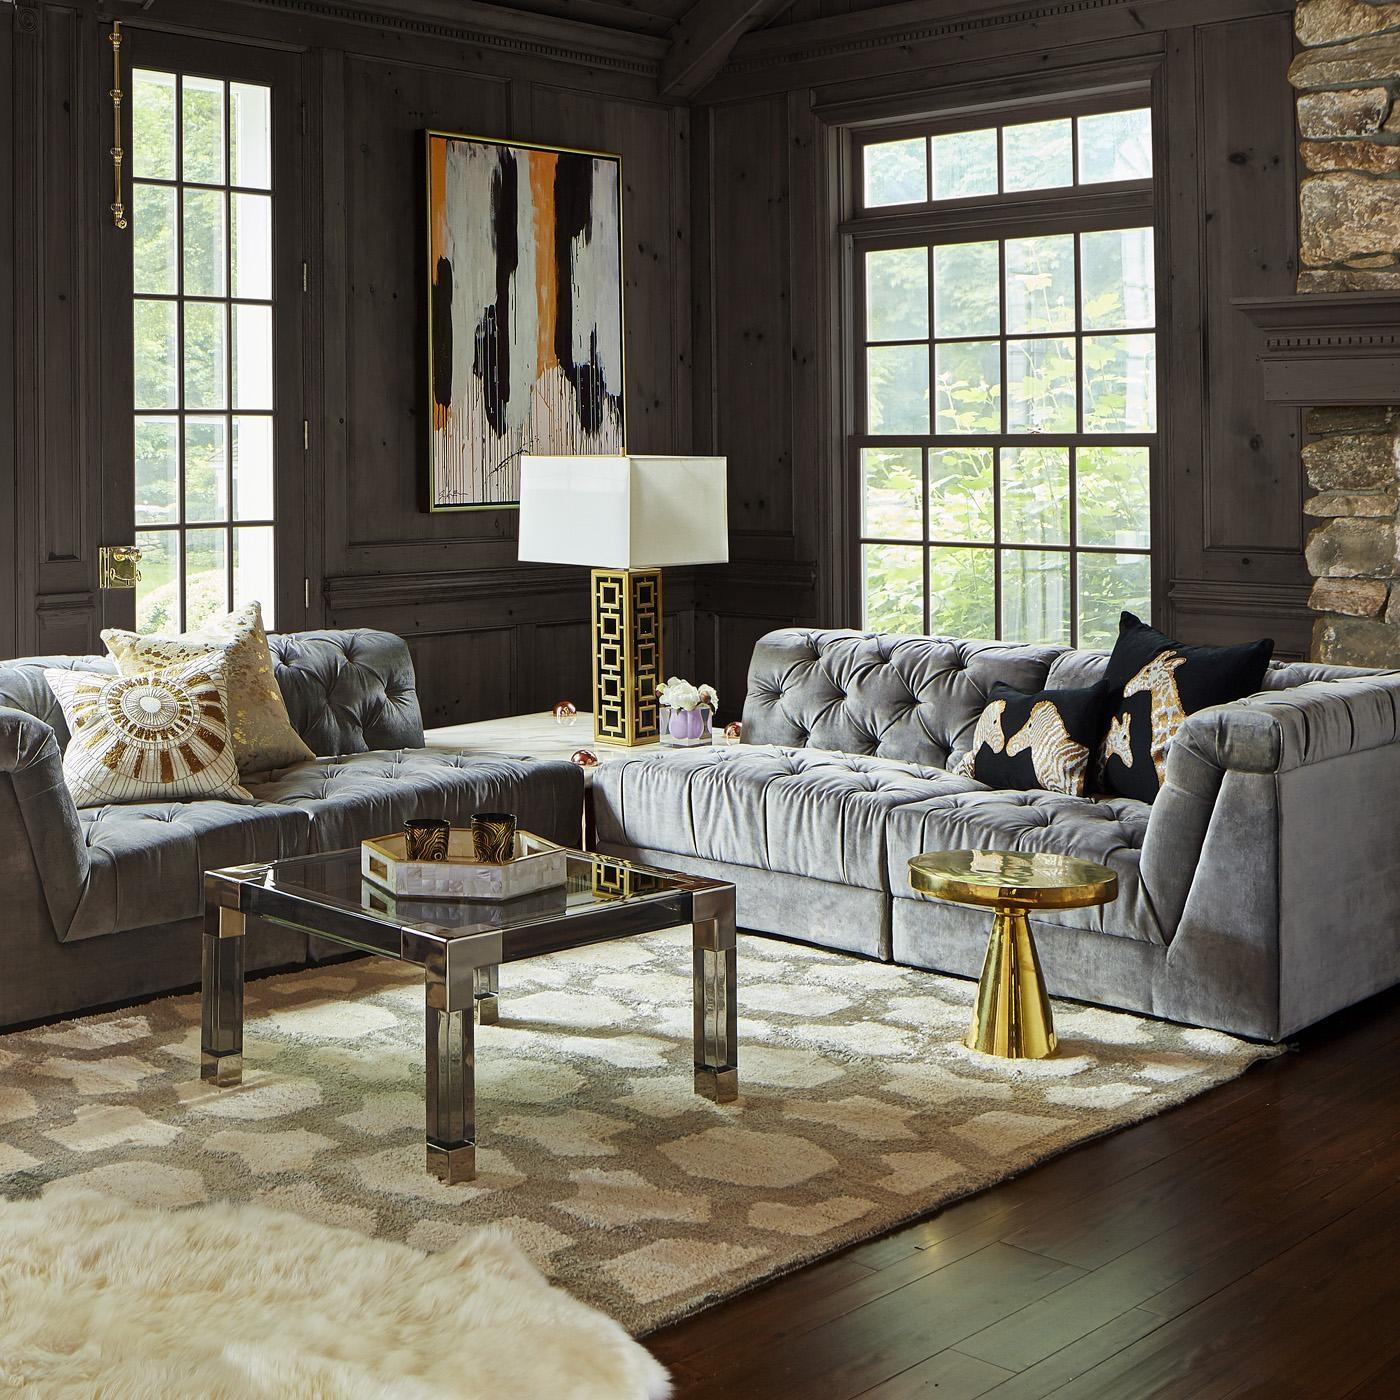 Ultra Charcoal Sectional Modular Sofa | Modern Furniture for Jonathan Sofa